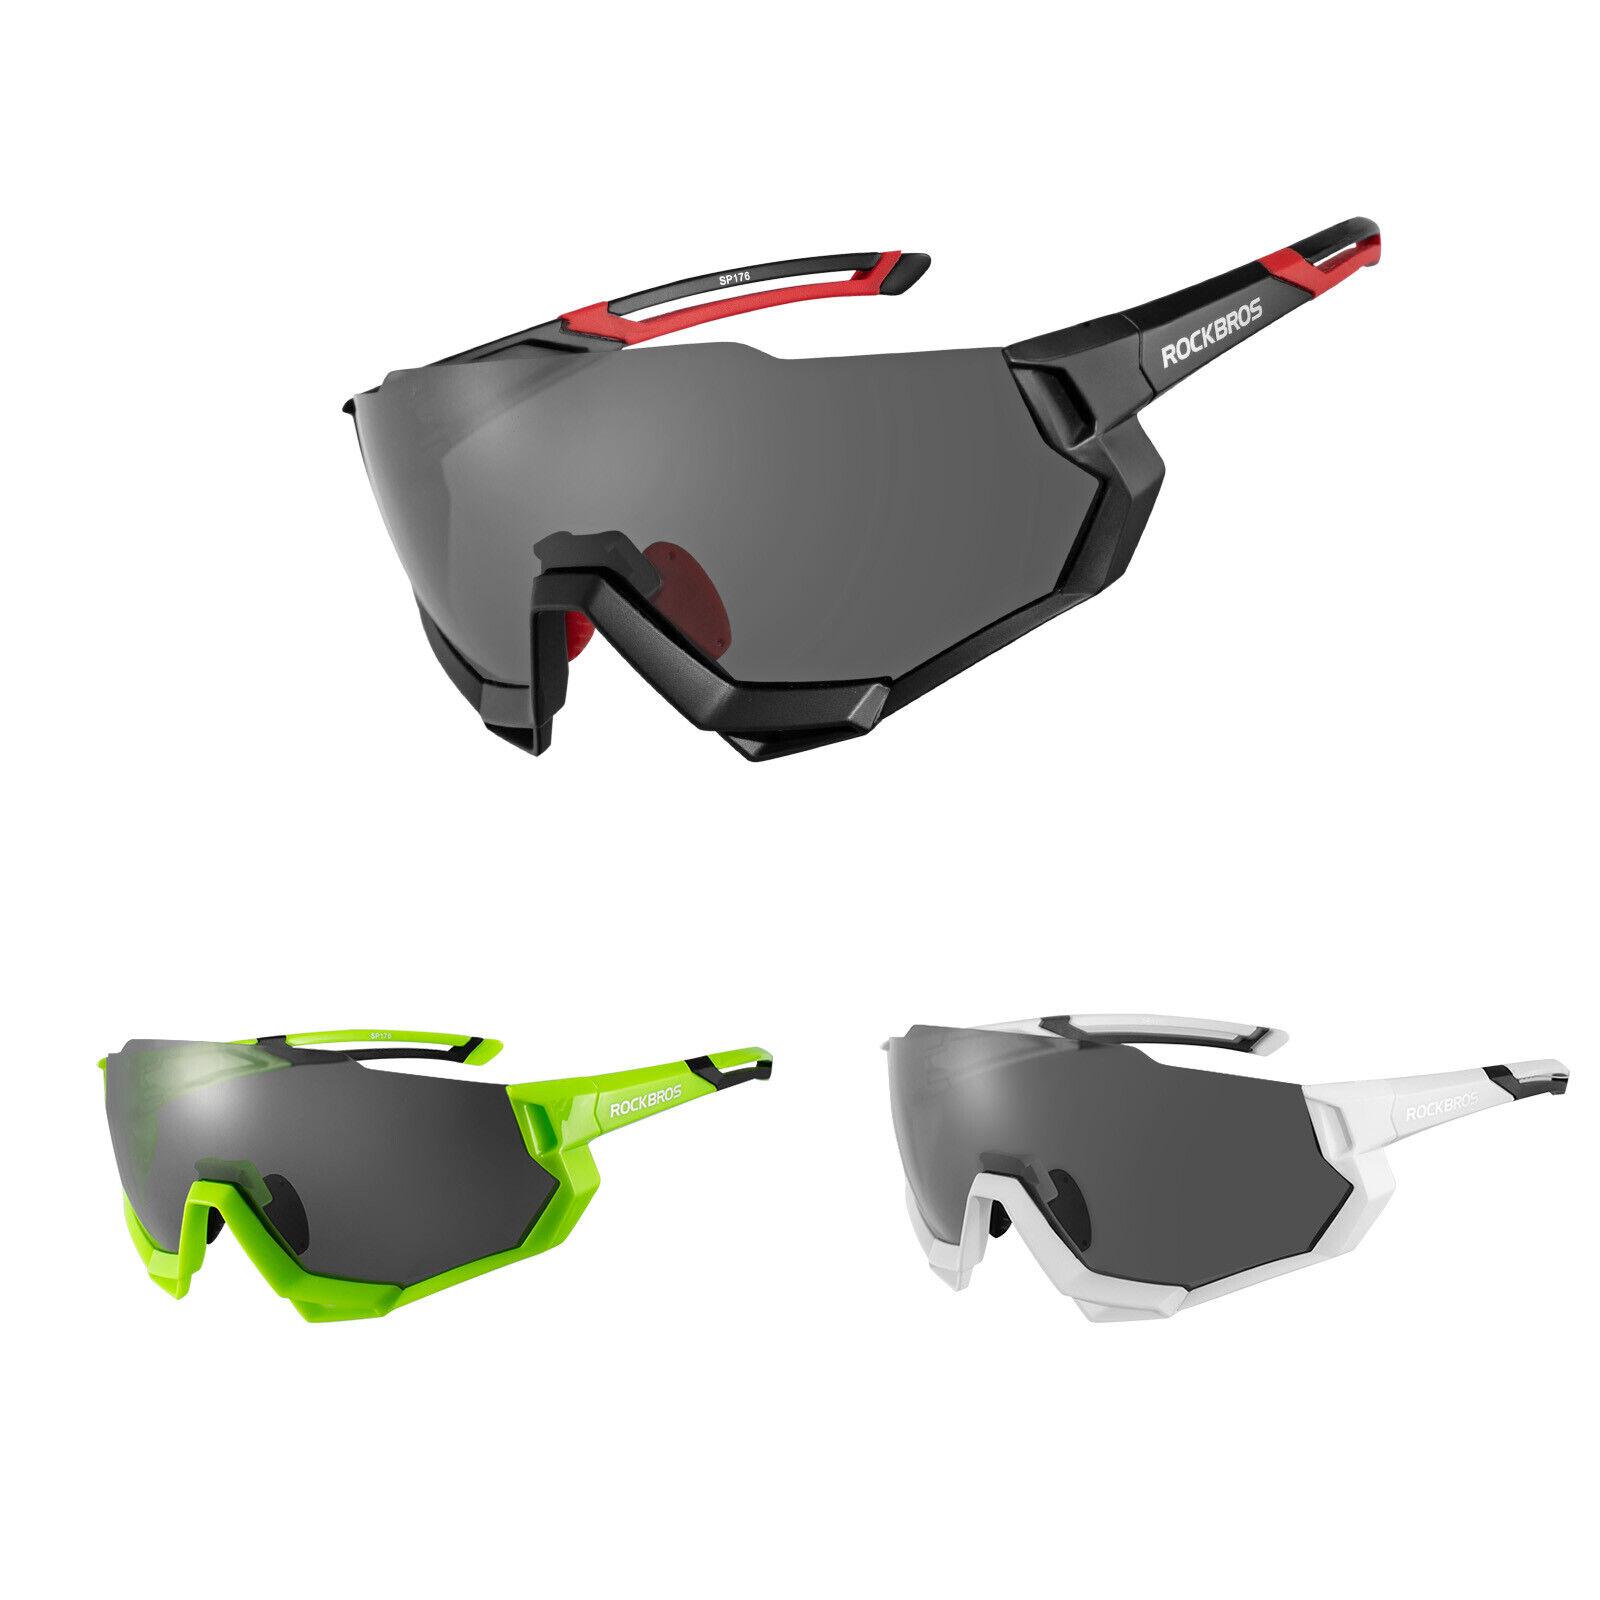 ROCKBROS Fahhrad Radbrille Polarisierte Sonnebrille Wechselobjektive 3 Farbe